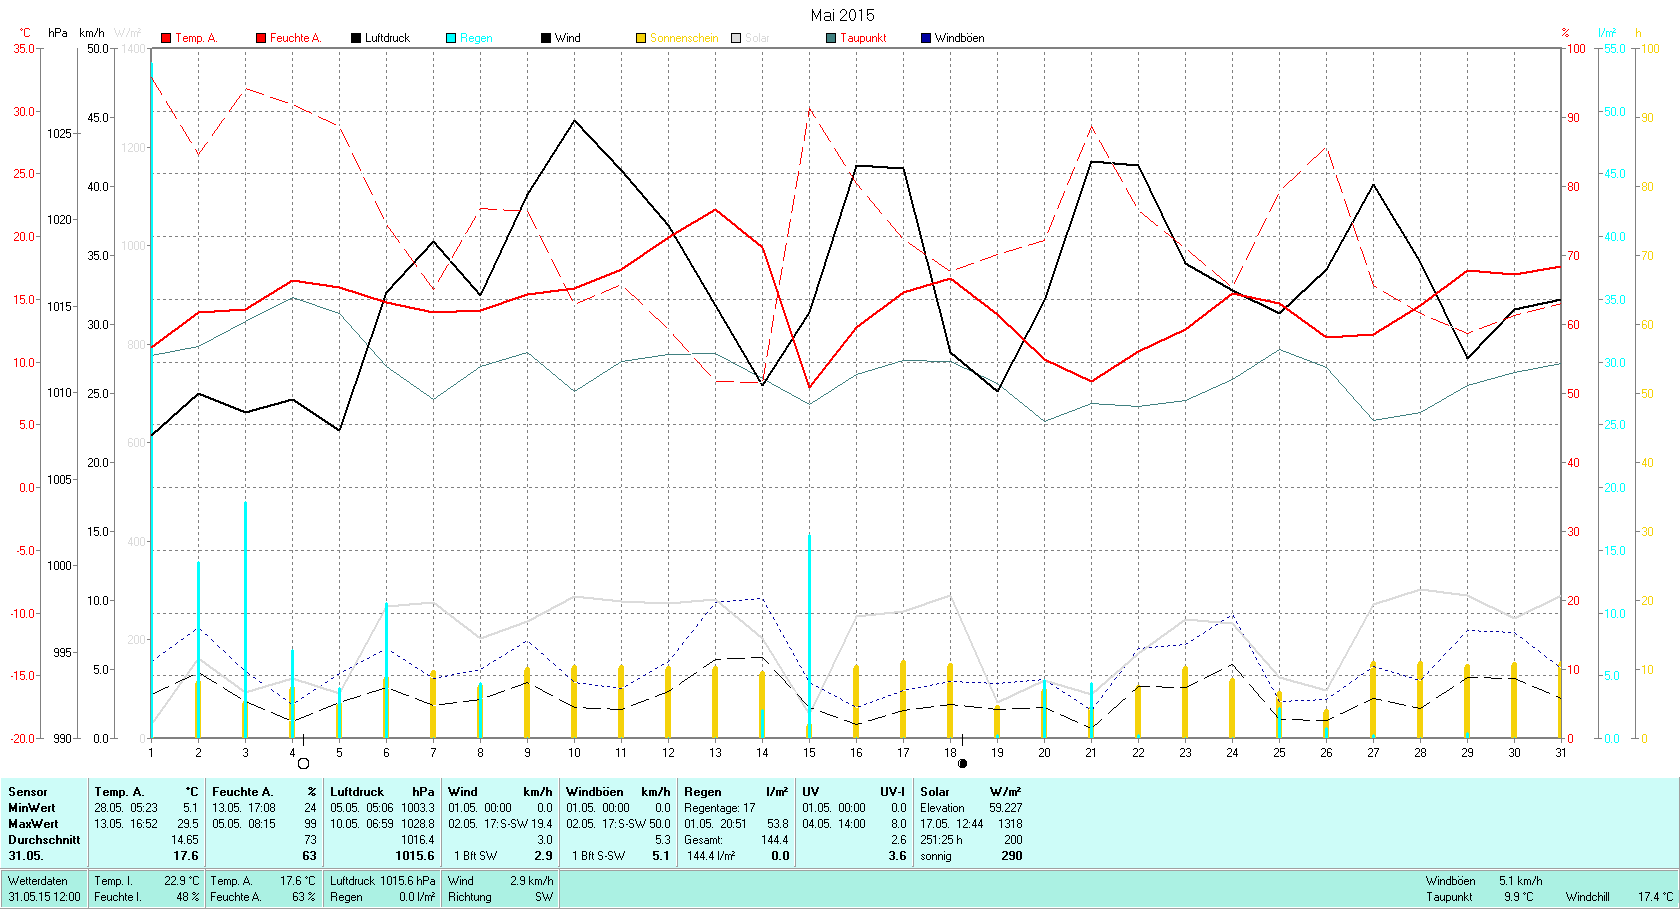 Mai 2015 Tmin 5.1°C, Tmax 29.5°C, Sonne 251.25h, Niederschlag 144.4mm/2